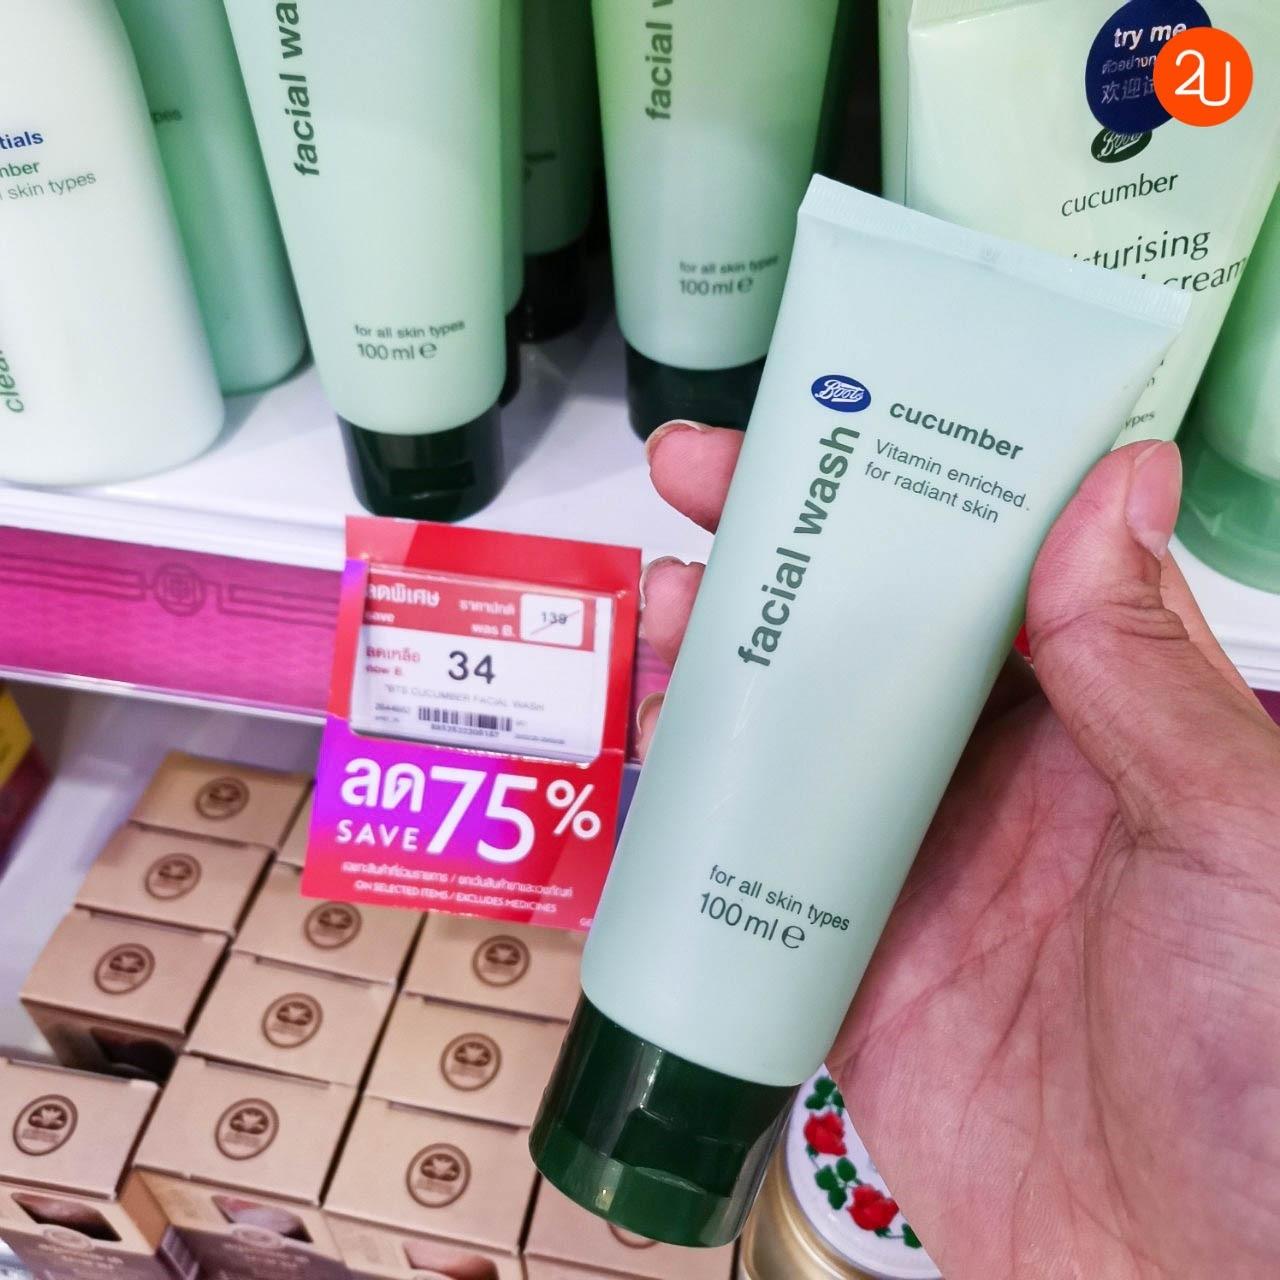 Facial Wash Vitamin enriched for radiant skin